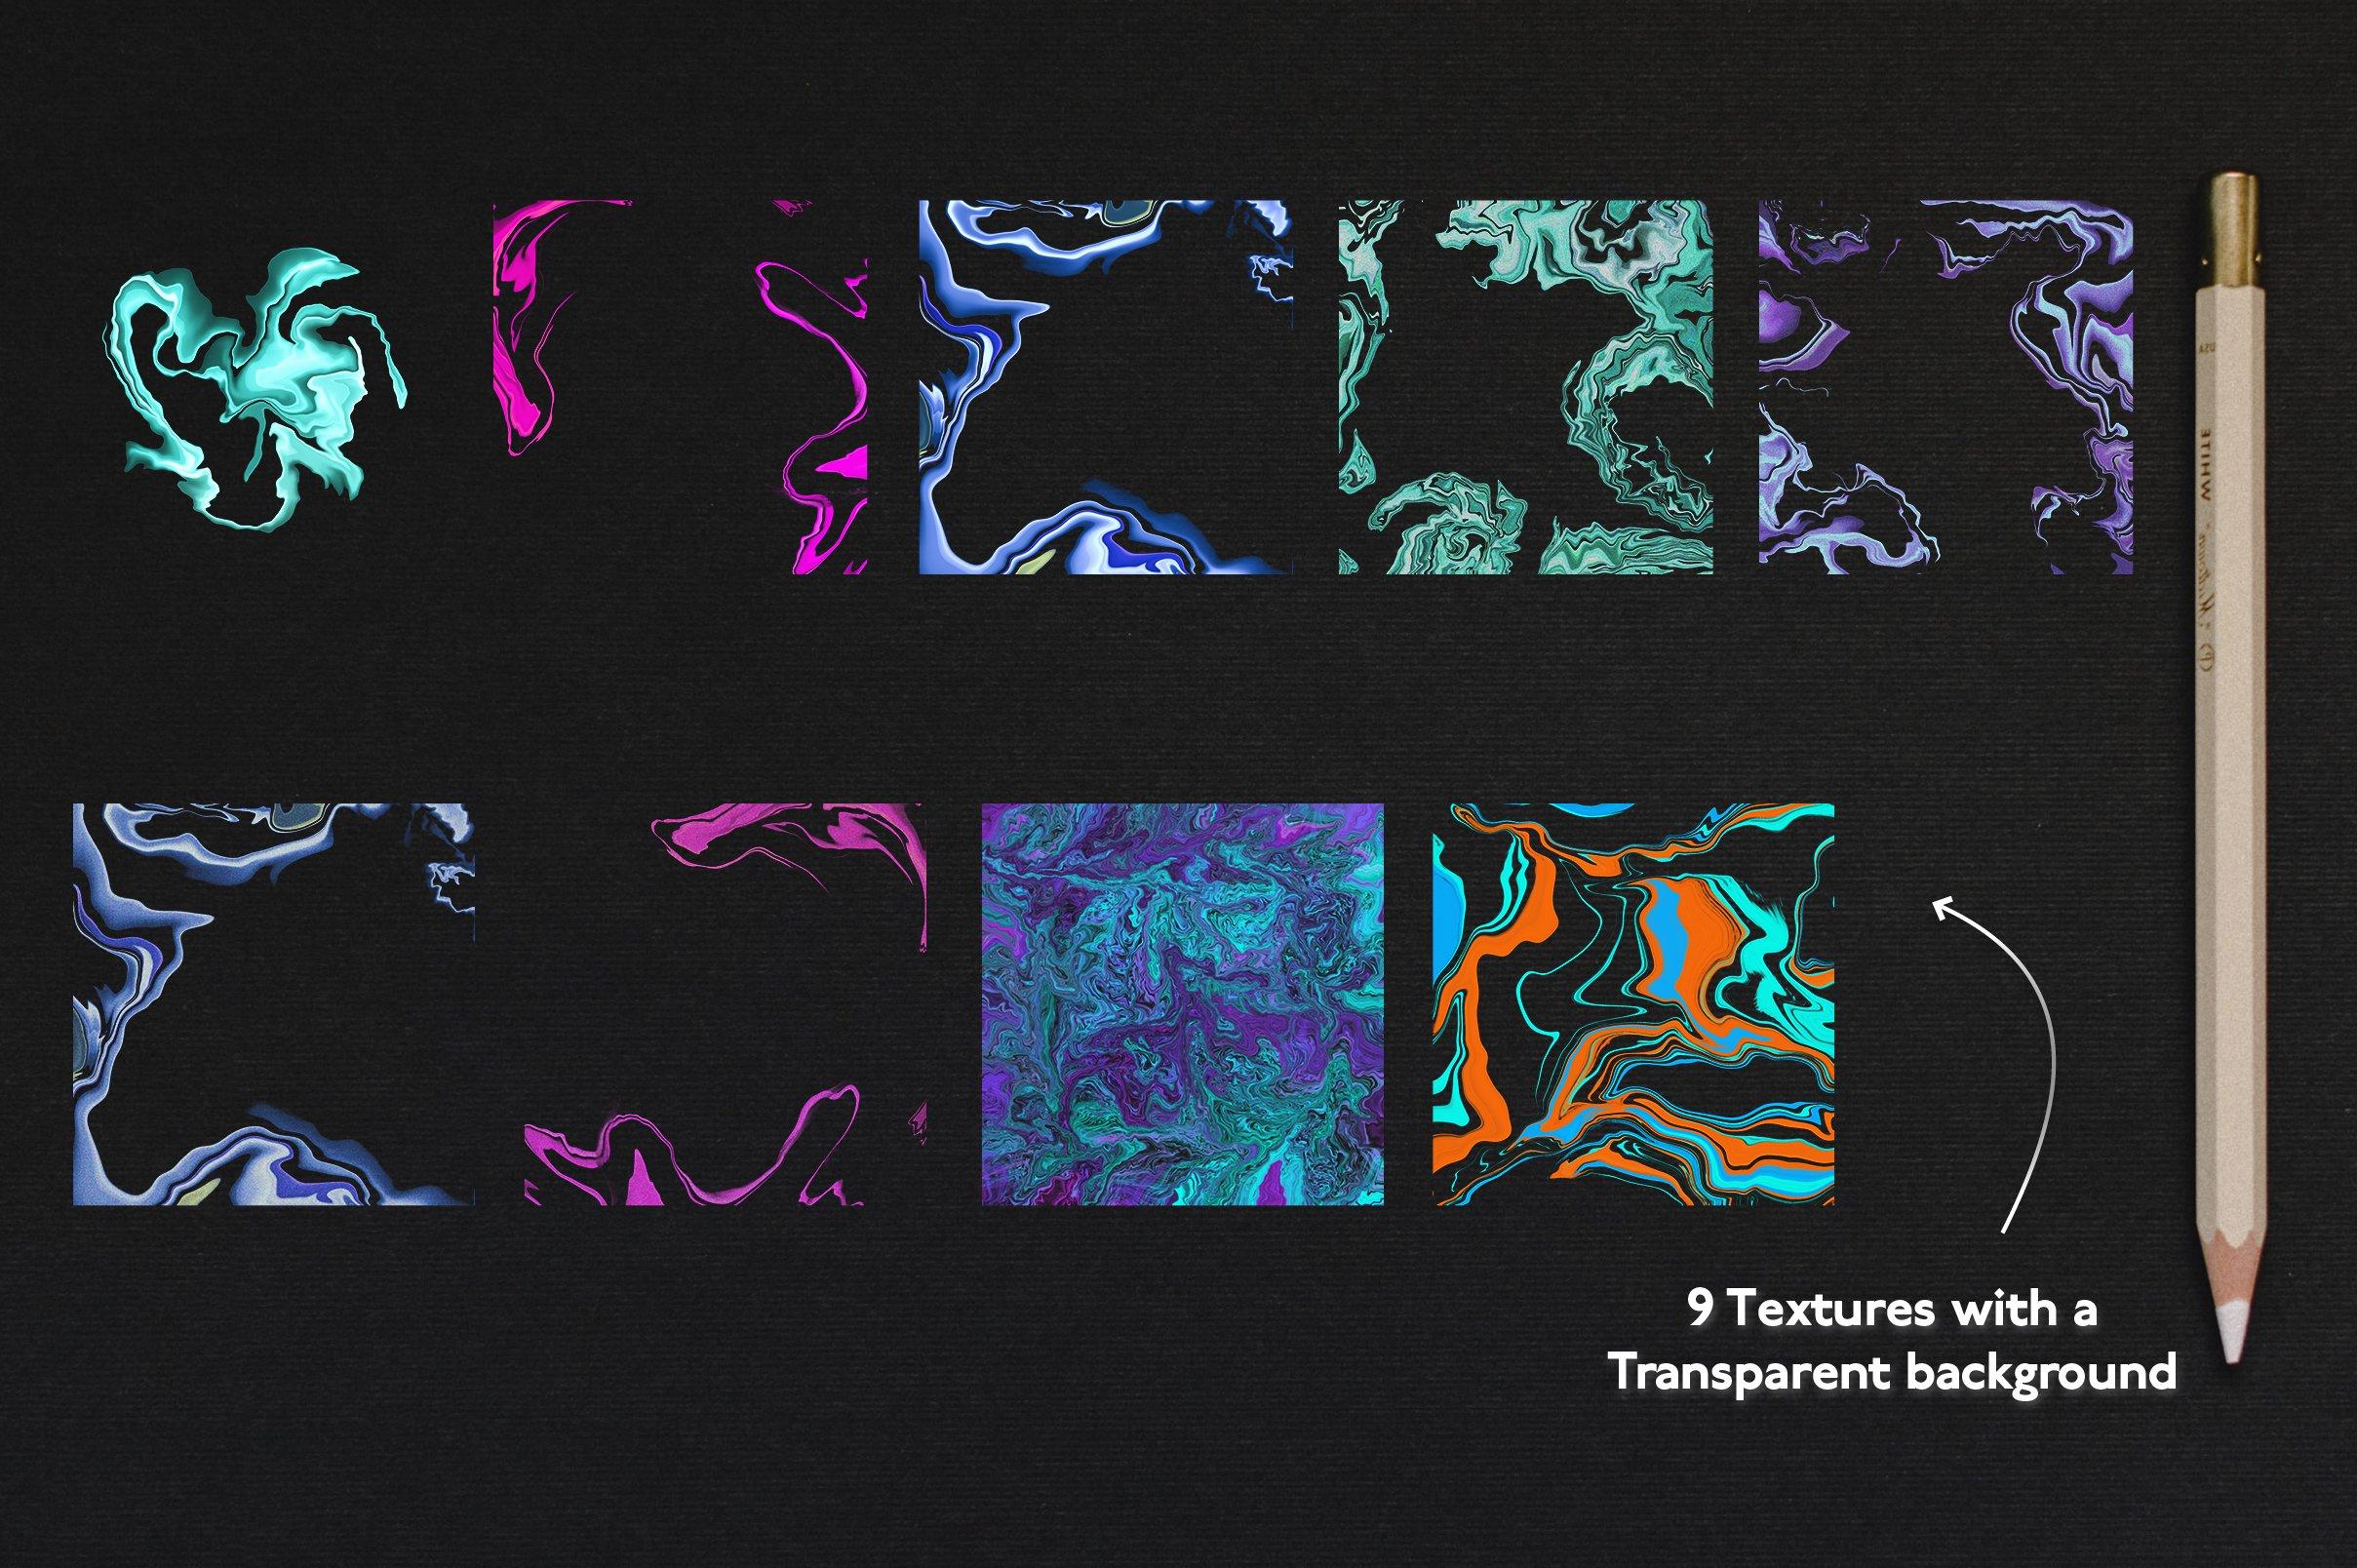 大理石纹理Procreate笔刷 Liquid Marble Texture Brush Bundle Noise插图(1)